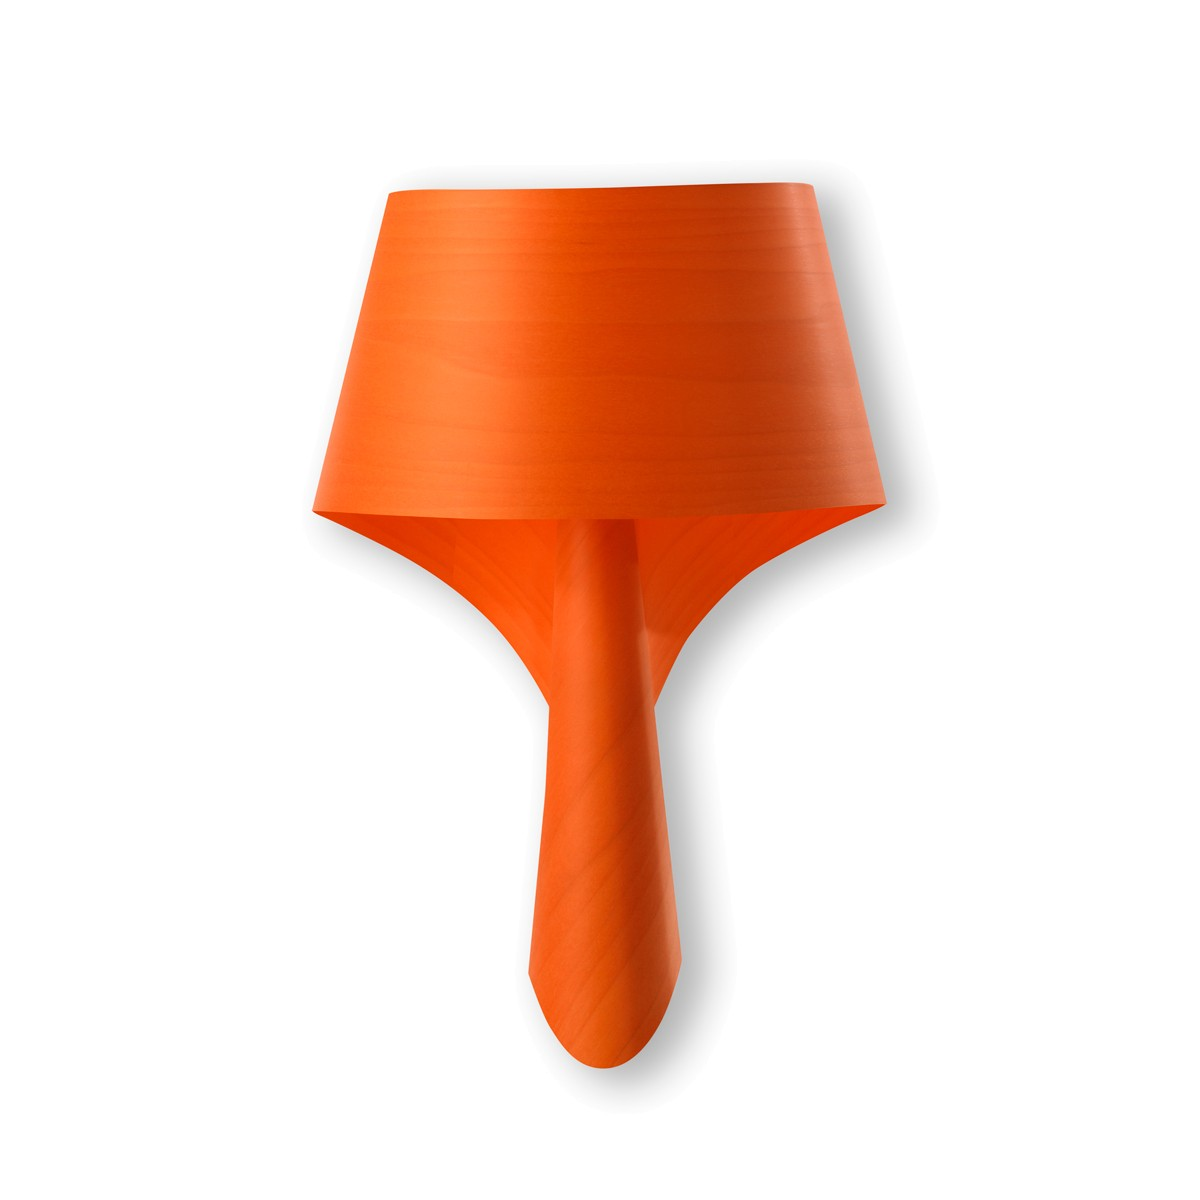 LZF Lamps Air Wandleuchte, orange